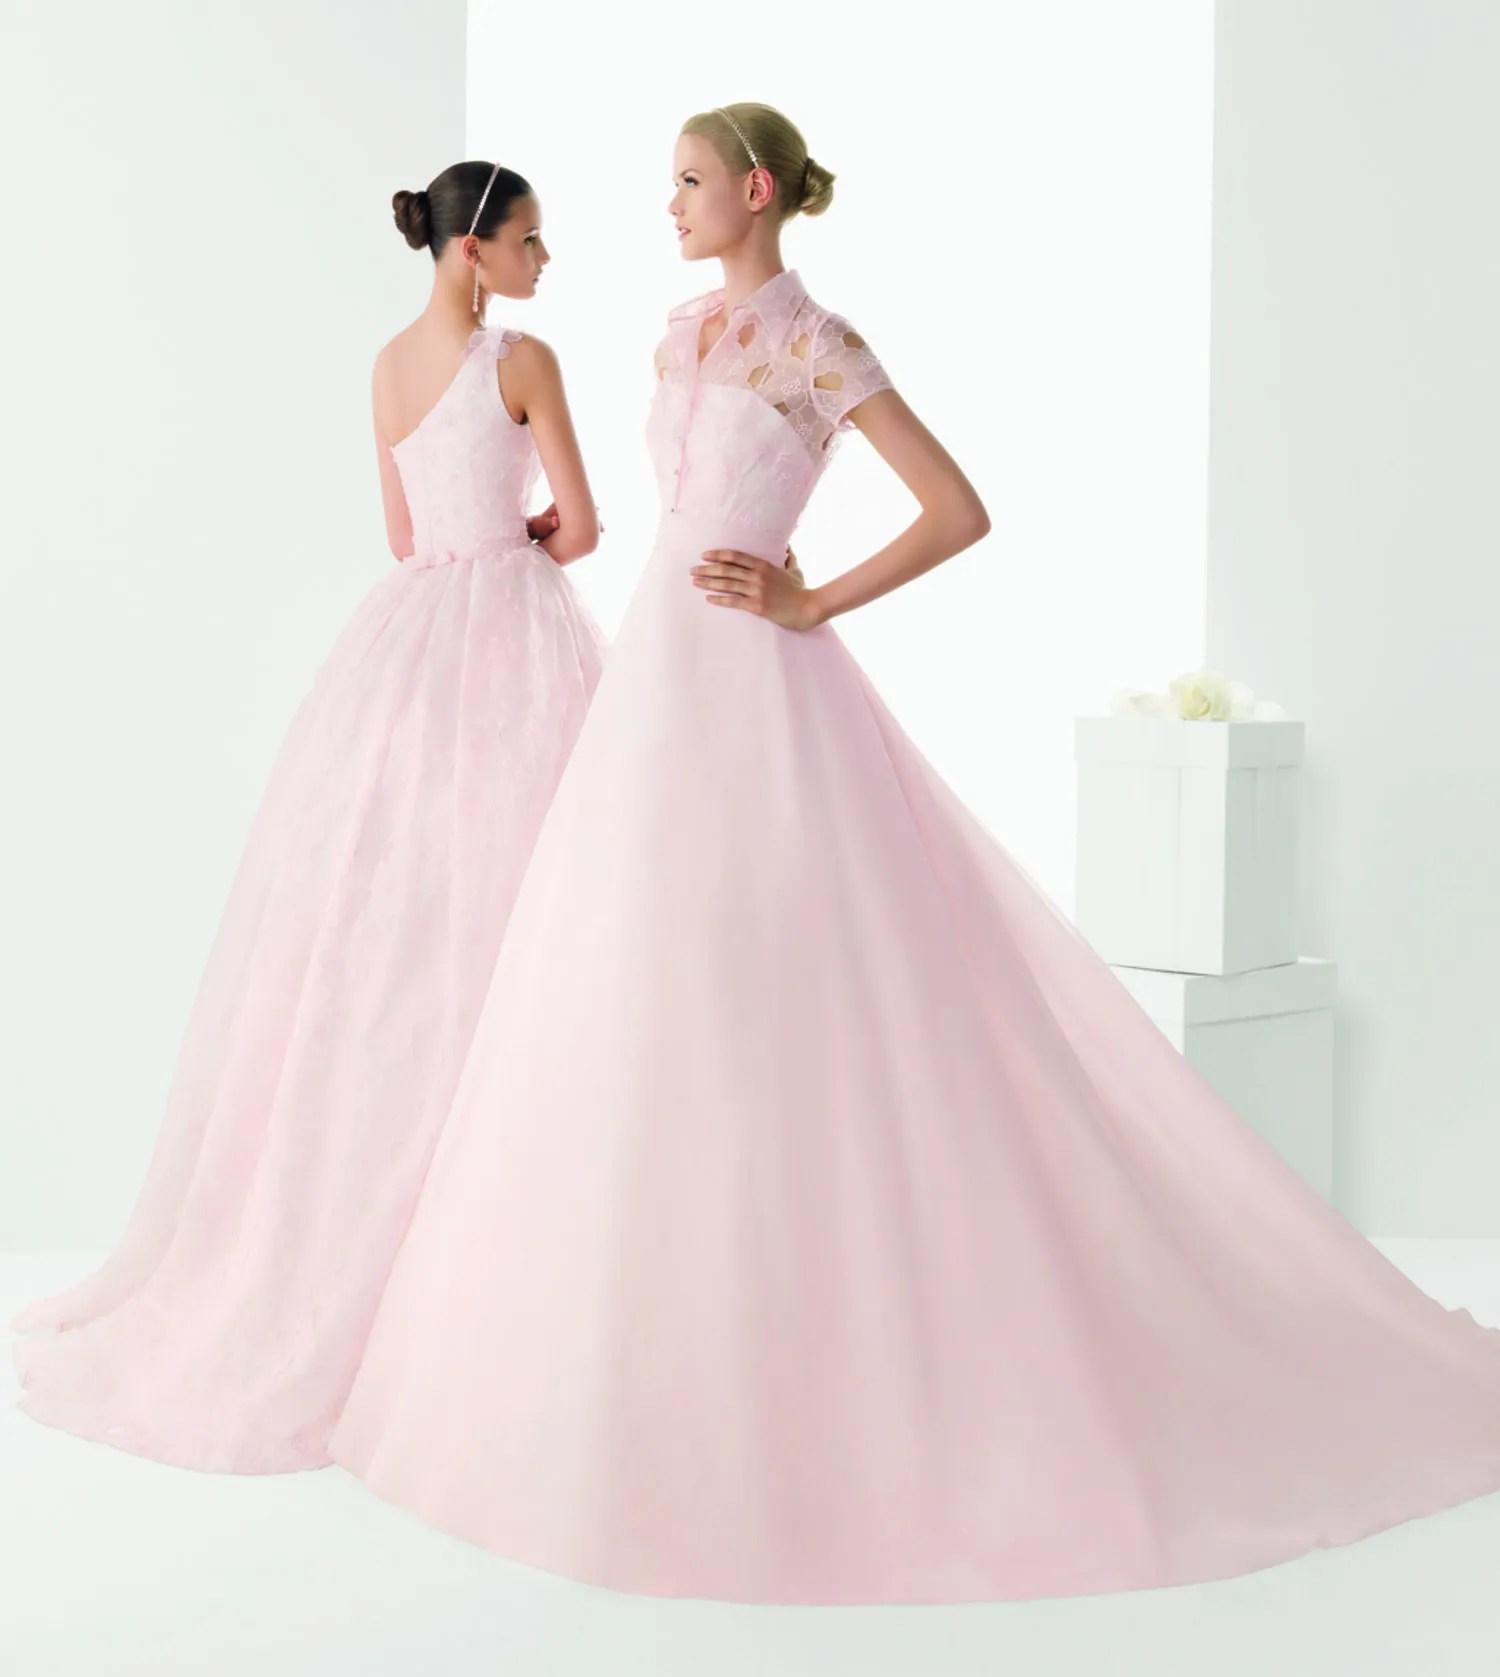 rosa clara wedding dresses south africa blush pink wedding dresses 3 Blush Colored Rosa Clara Wedding Dresses That Ll Make You Cry Pink Tears Of Wonderful